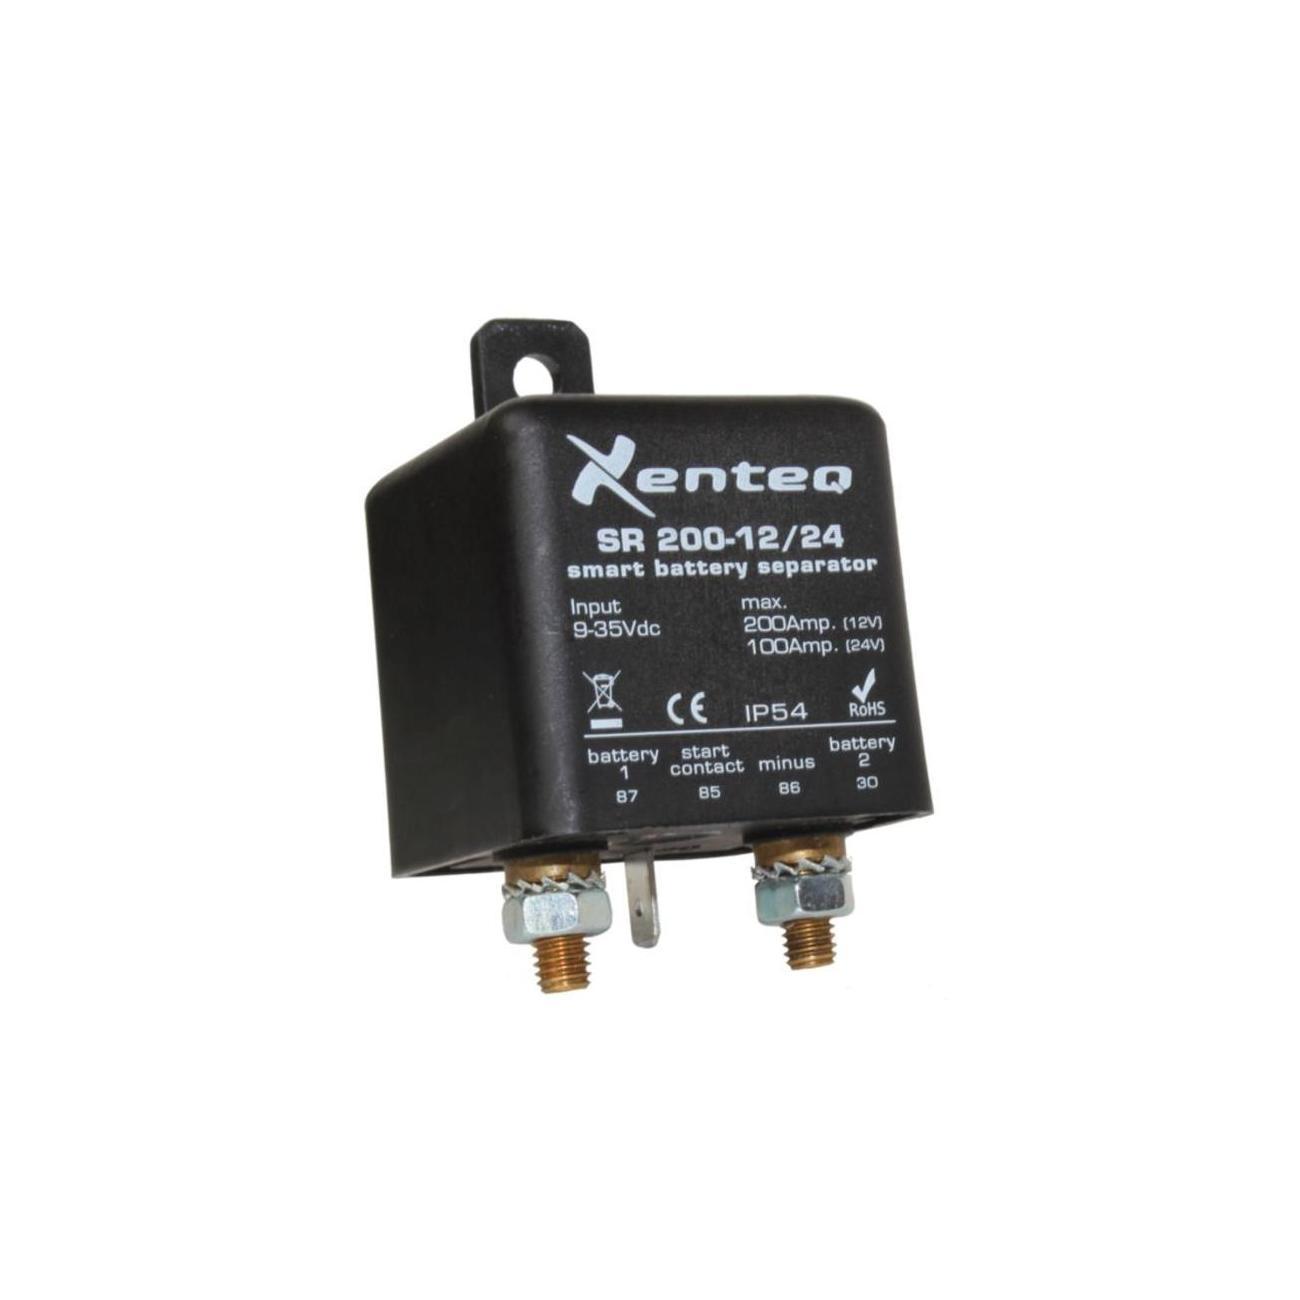 Isolating Relay 12/24Vdc, 200Amp Max. (SR 200-12/24)